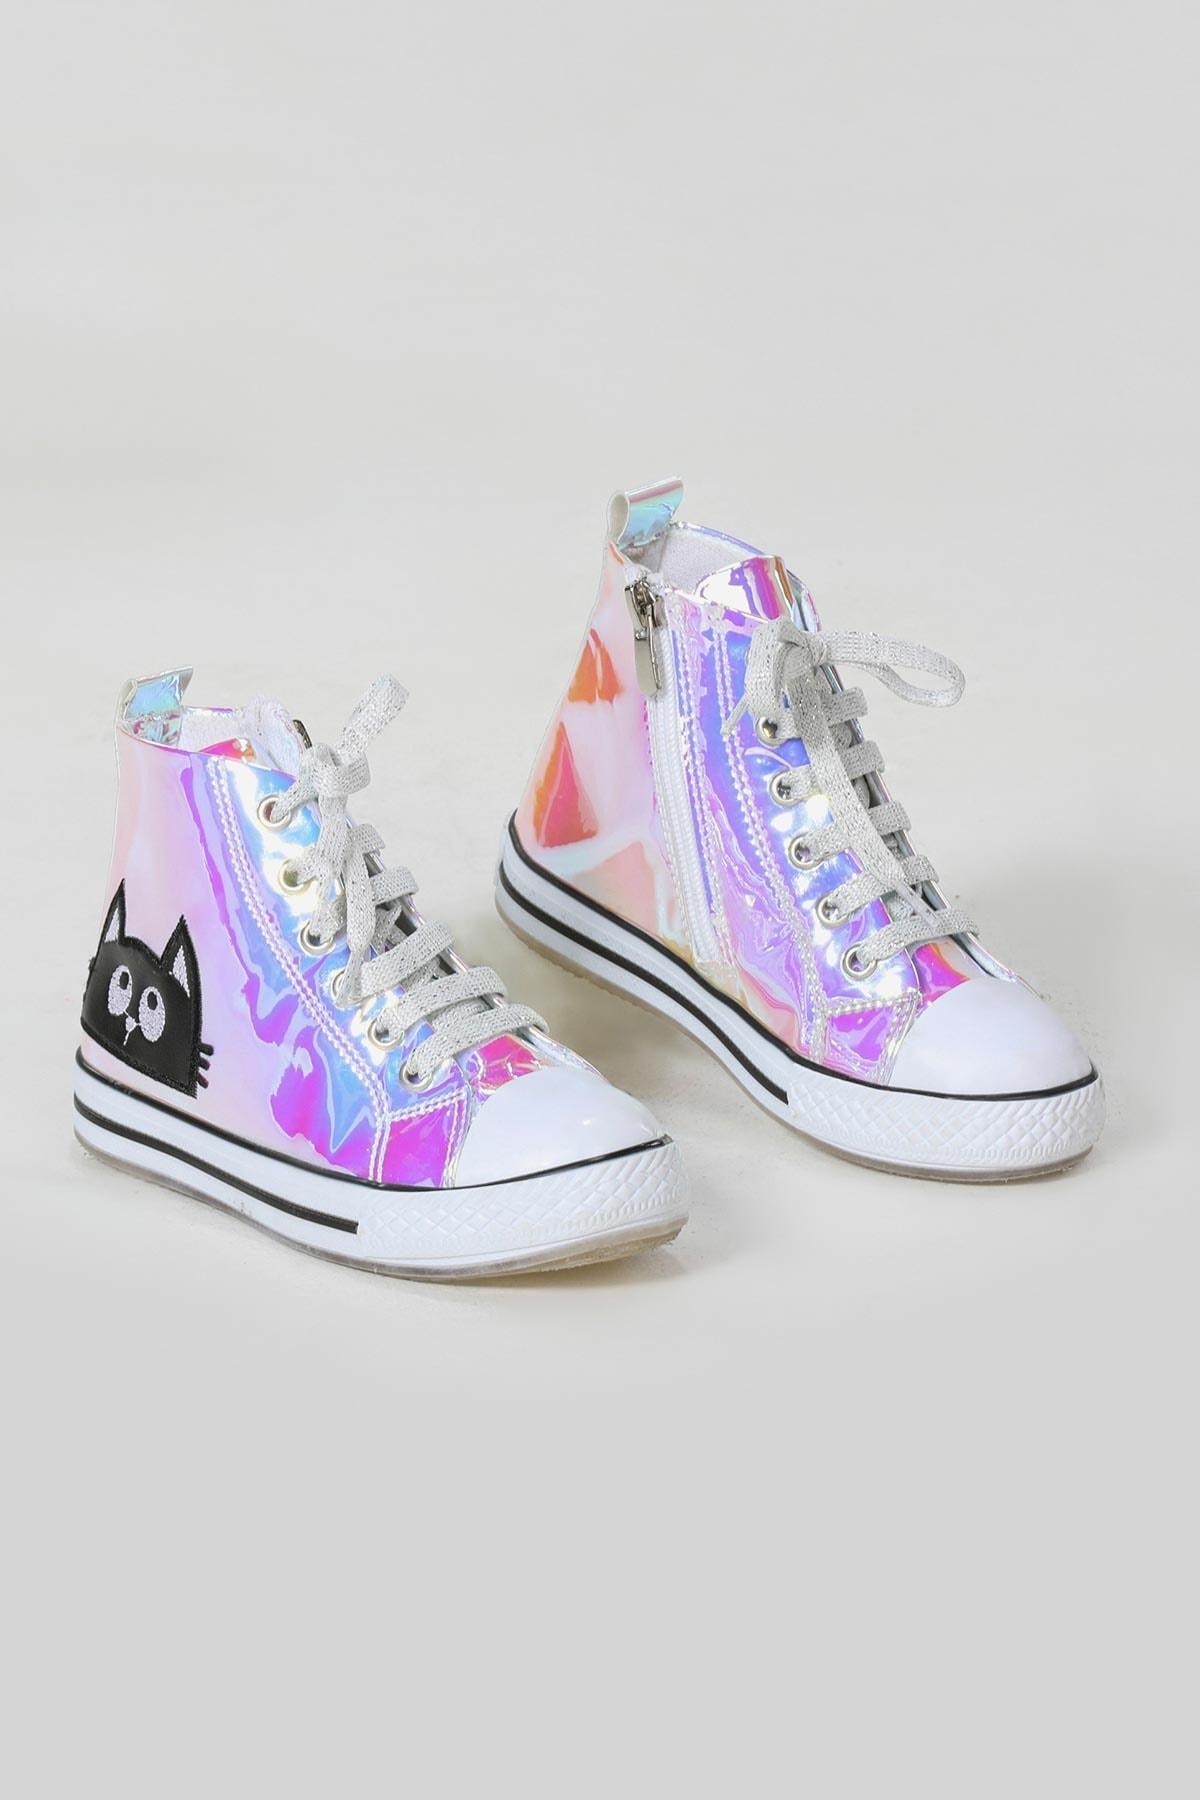 ZENOKIDO Kedi Pembe Hologramlı Kız Sneakers Ayakkabı 2